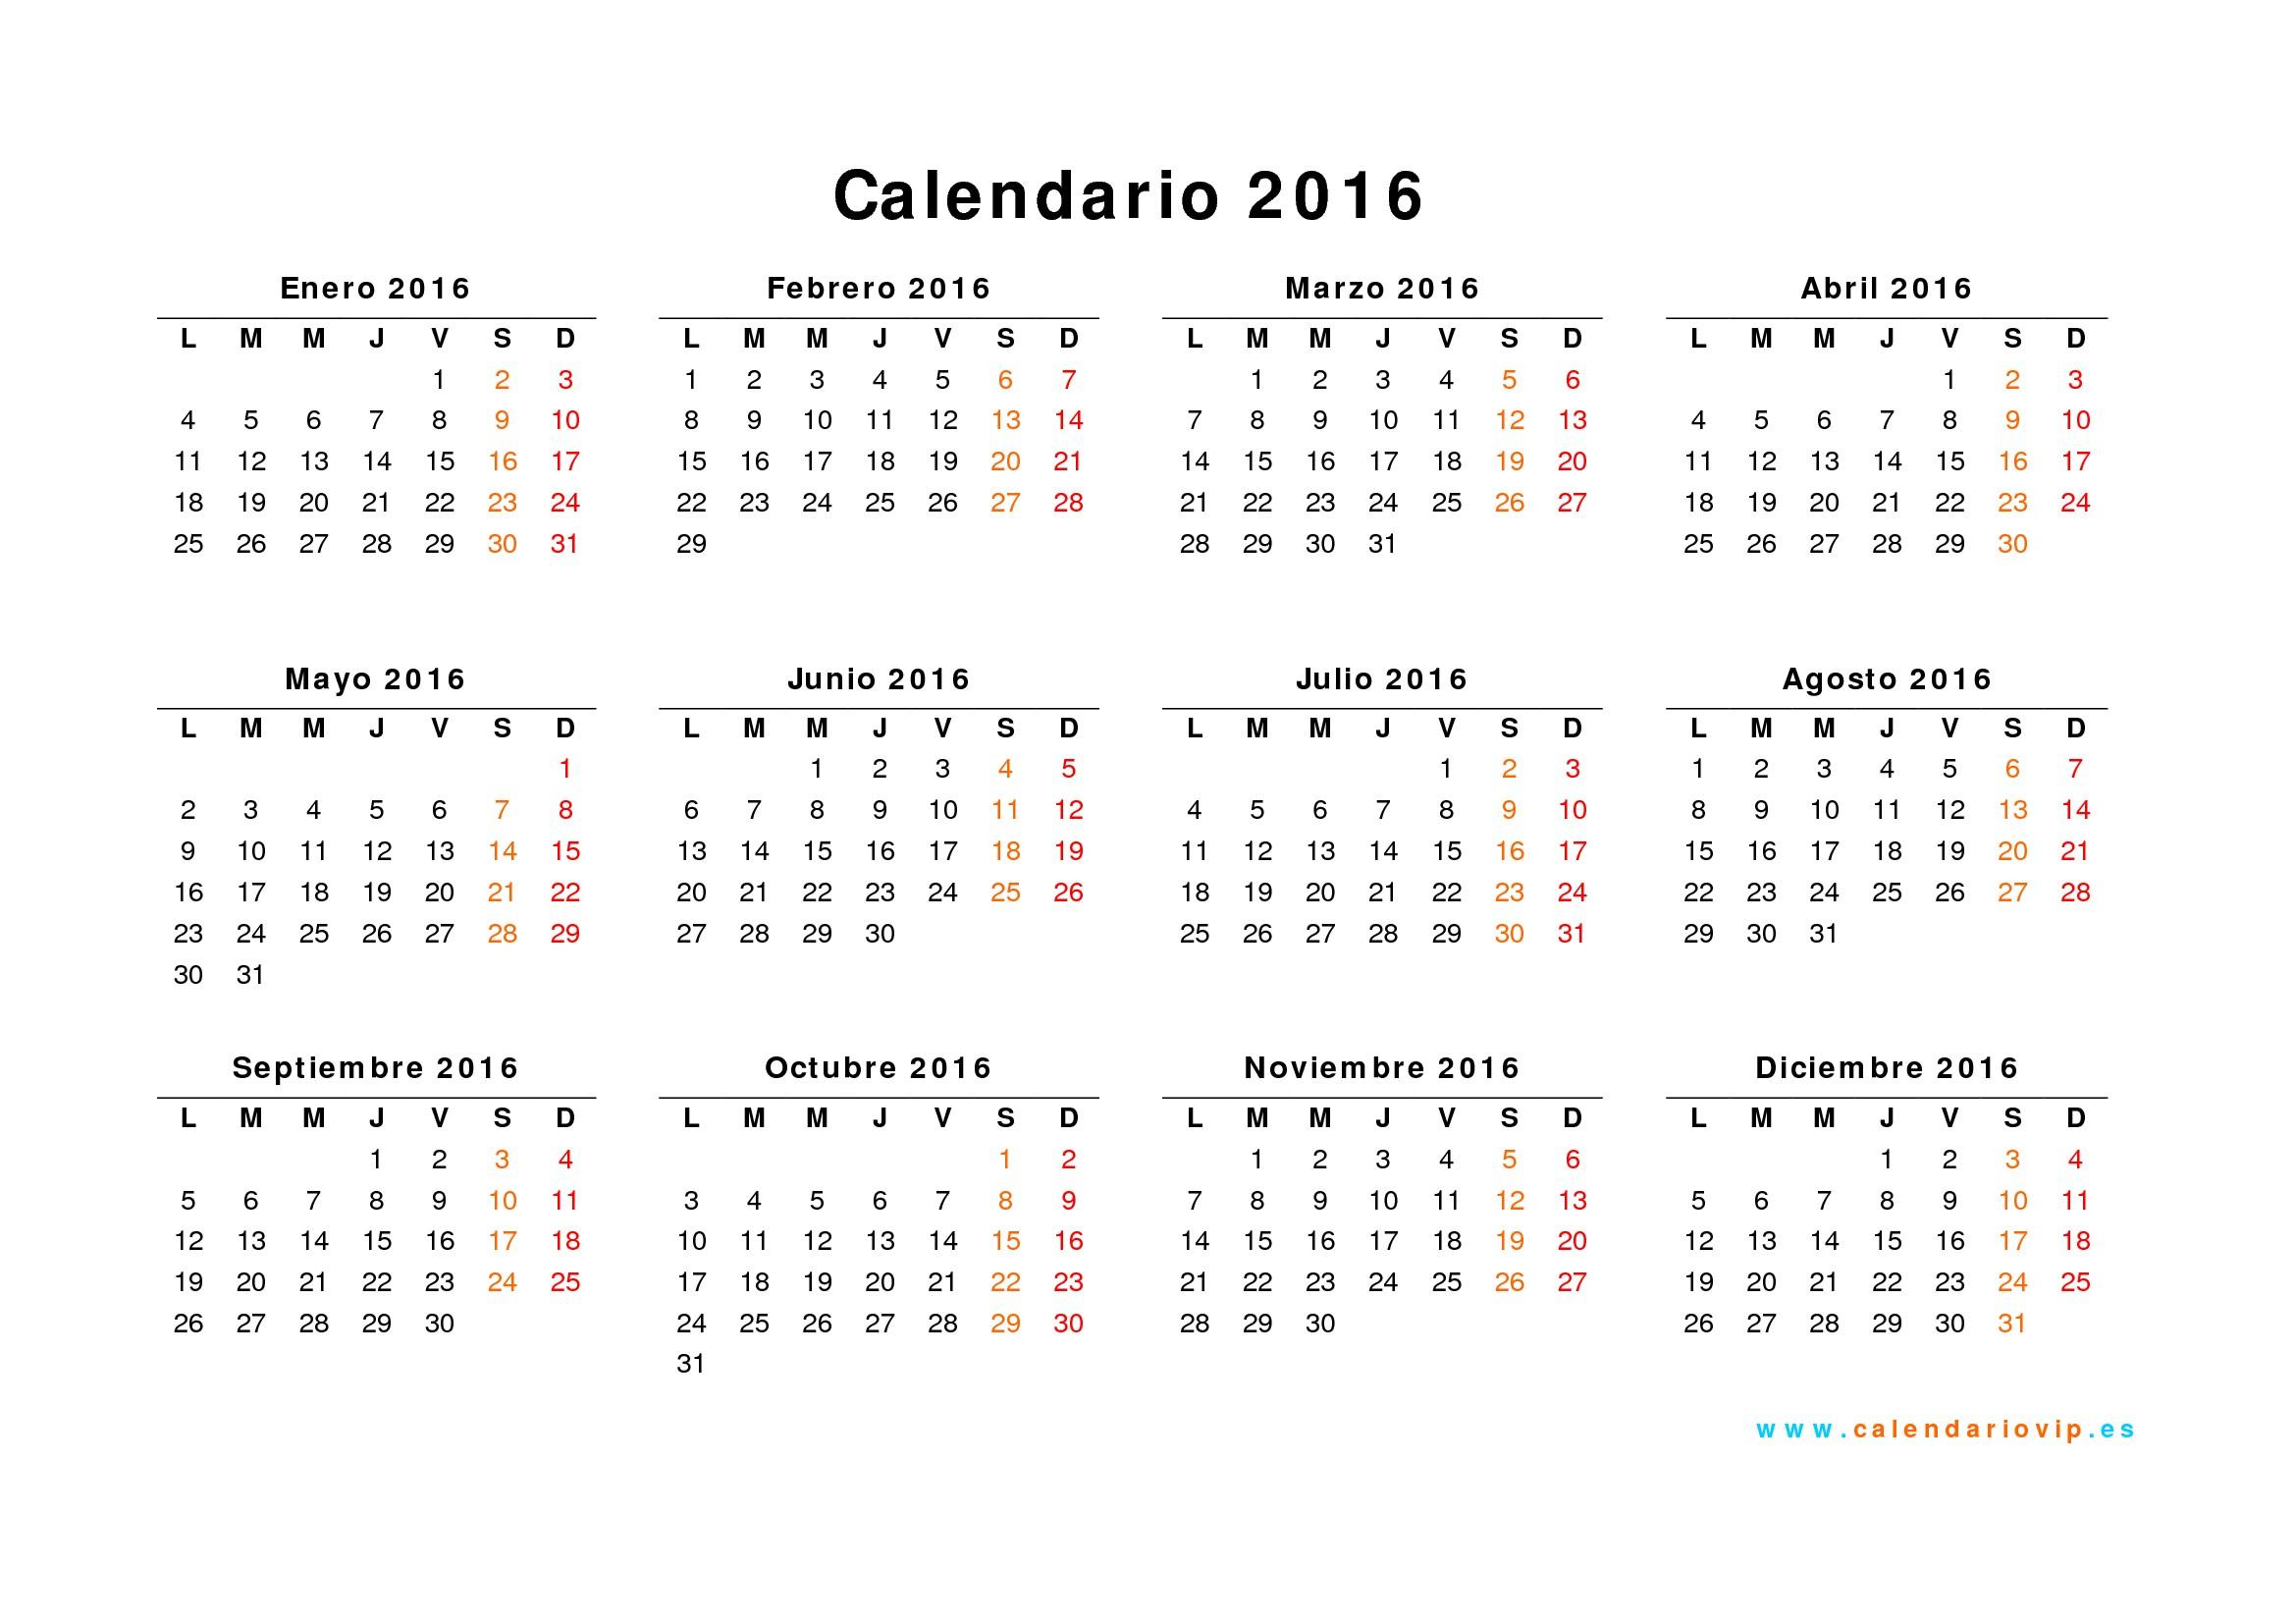 plantilla calendario 2016 numero semana calendarios anuales 2016 04 wNoFAU